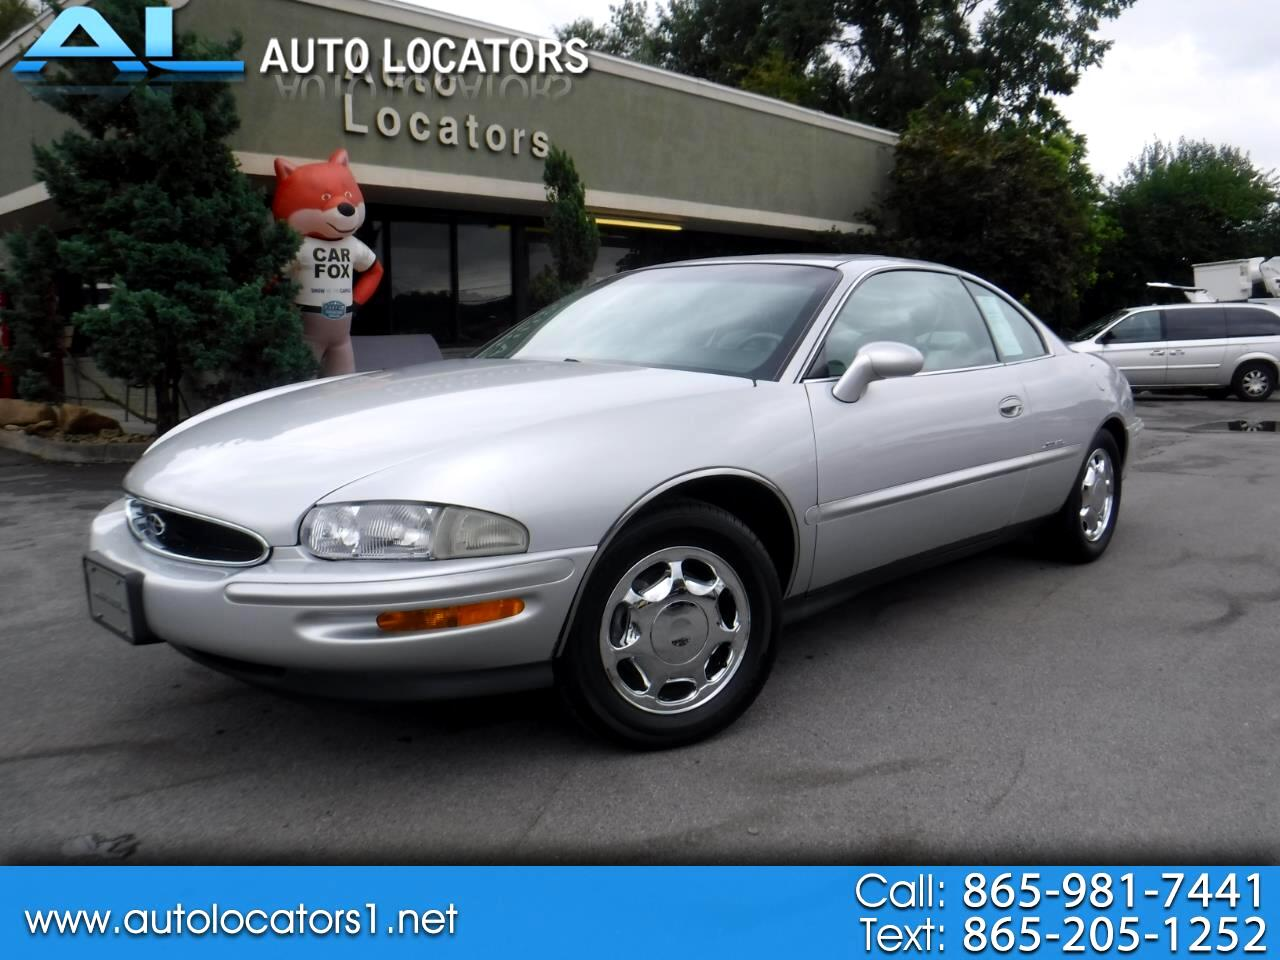 1999 Buick Riviera 2dr Cpe